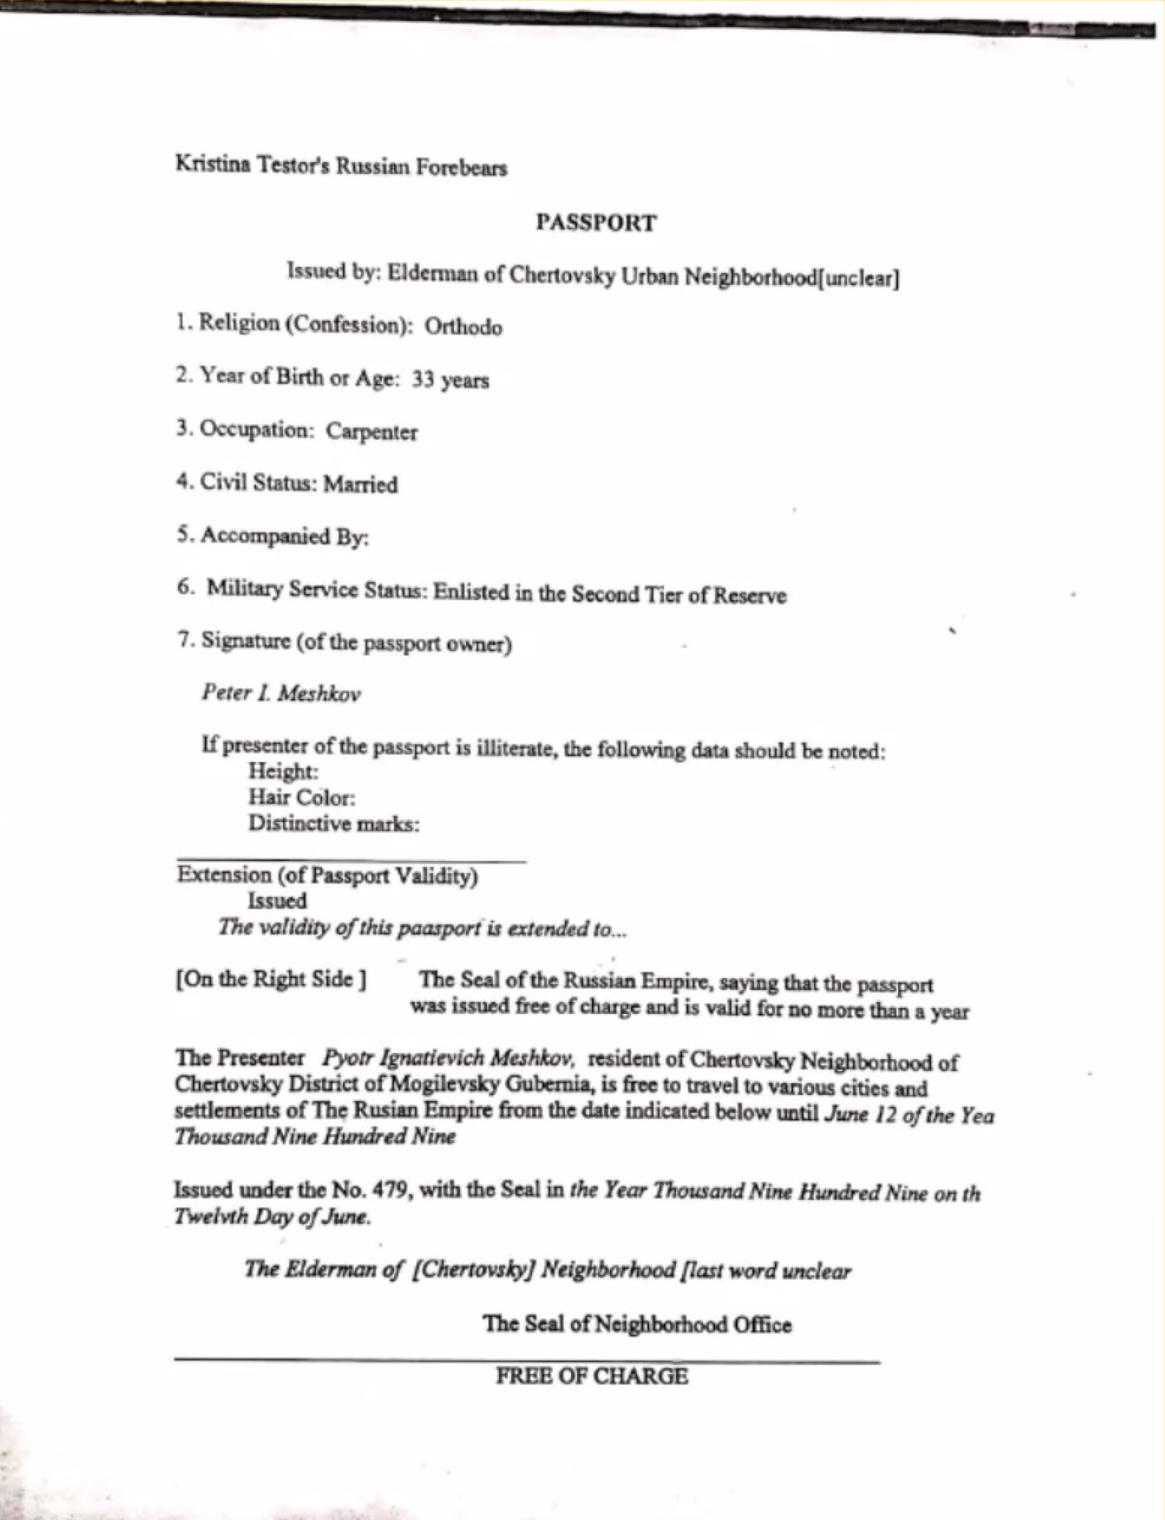 Dr. Garza Fathers Passport English Version copy - Family brings Russian culture to Nebraska